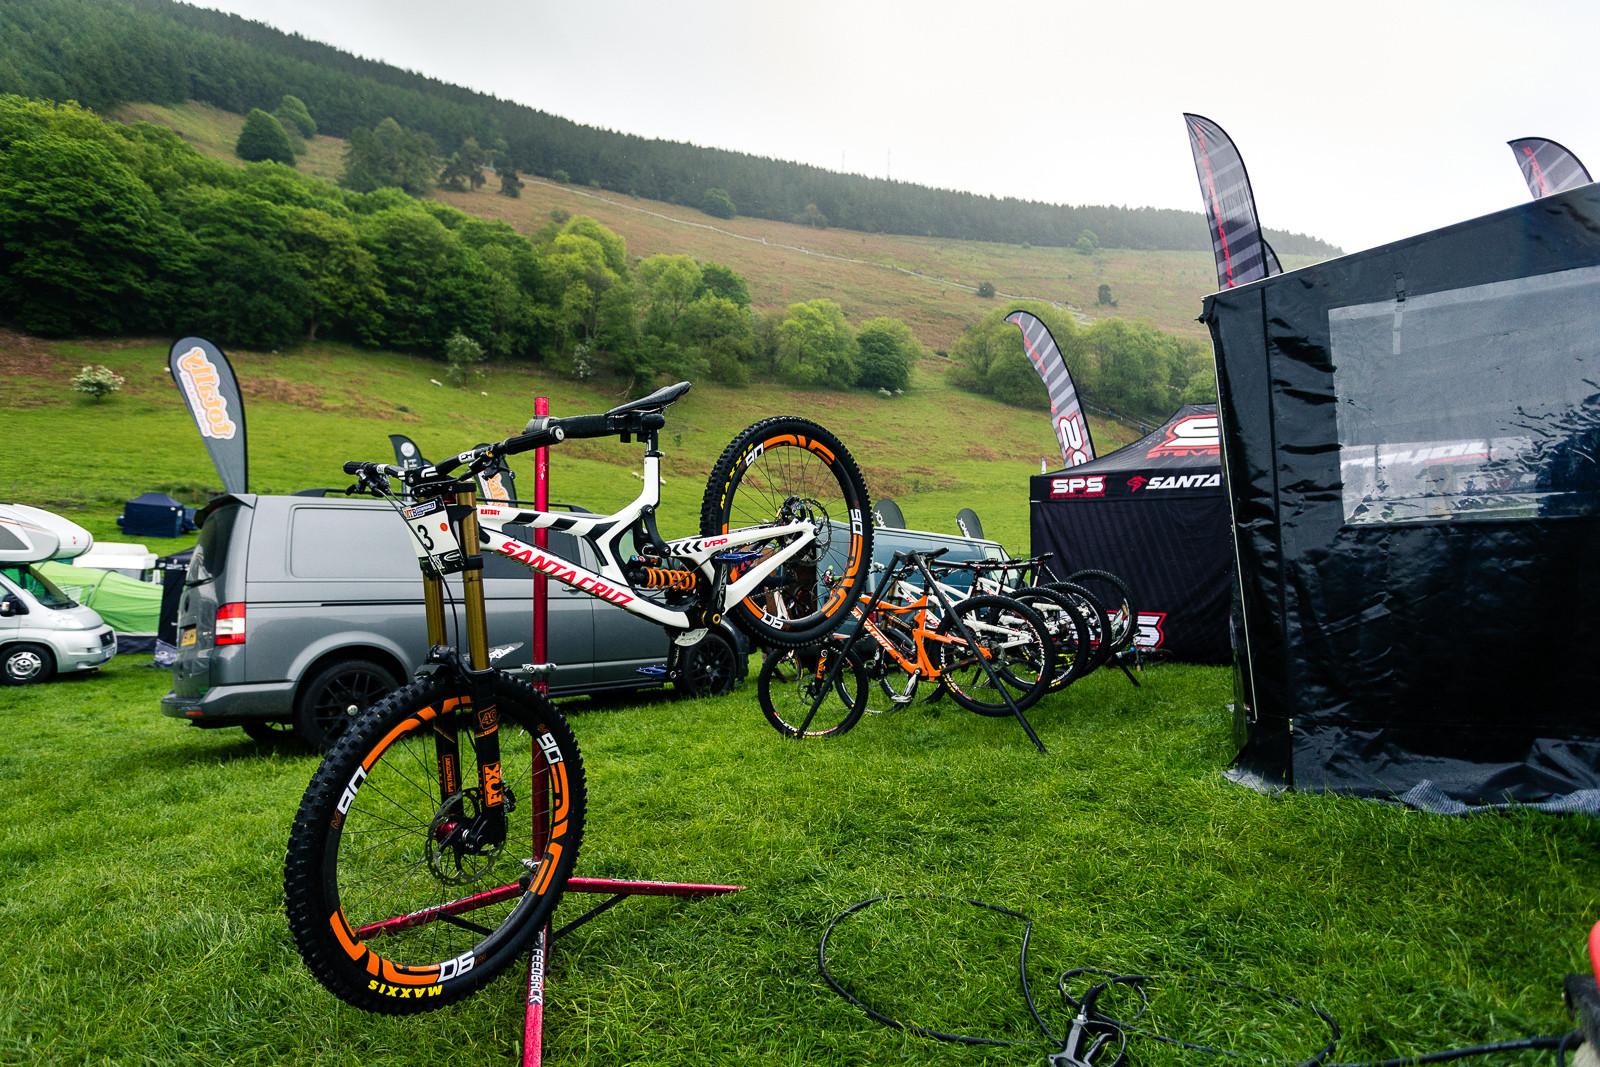 Josh Bryceland's Santa Cruz V10 at Llangollen BDS. - PIT BITS - British Downhill Series, Llangollen - Mountain Biking Pictures - Vital MTB